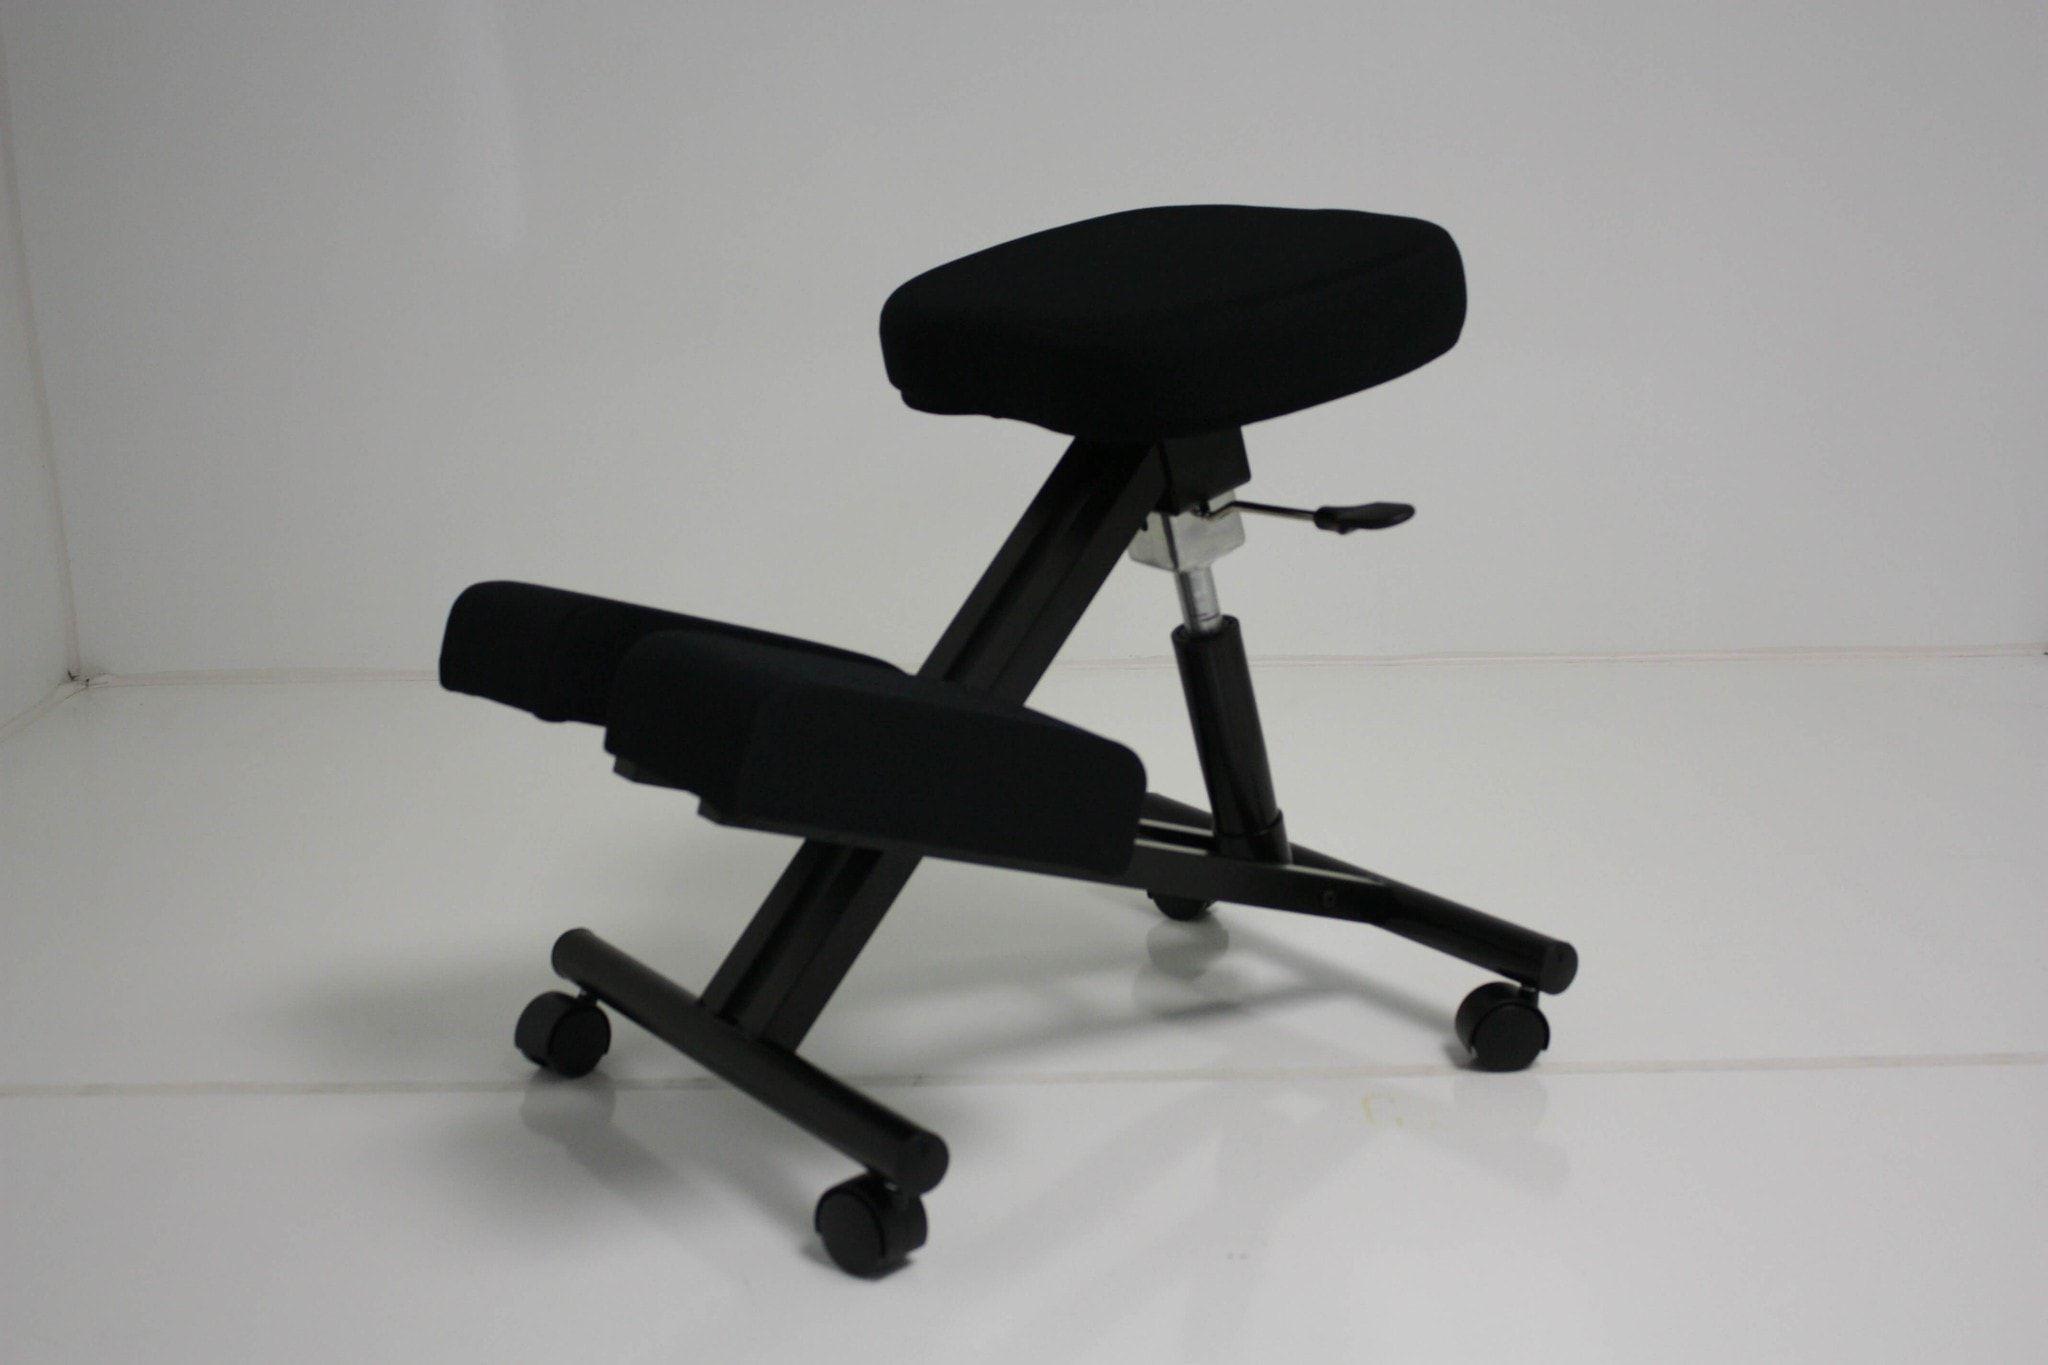 jobri kneeling chair uk ergonomic kneeling chair innovation chair